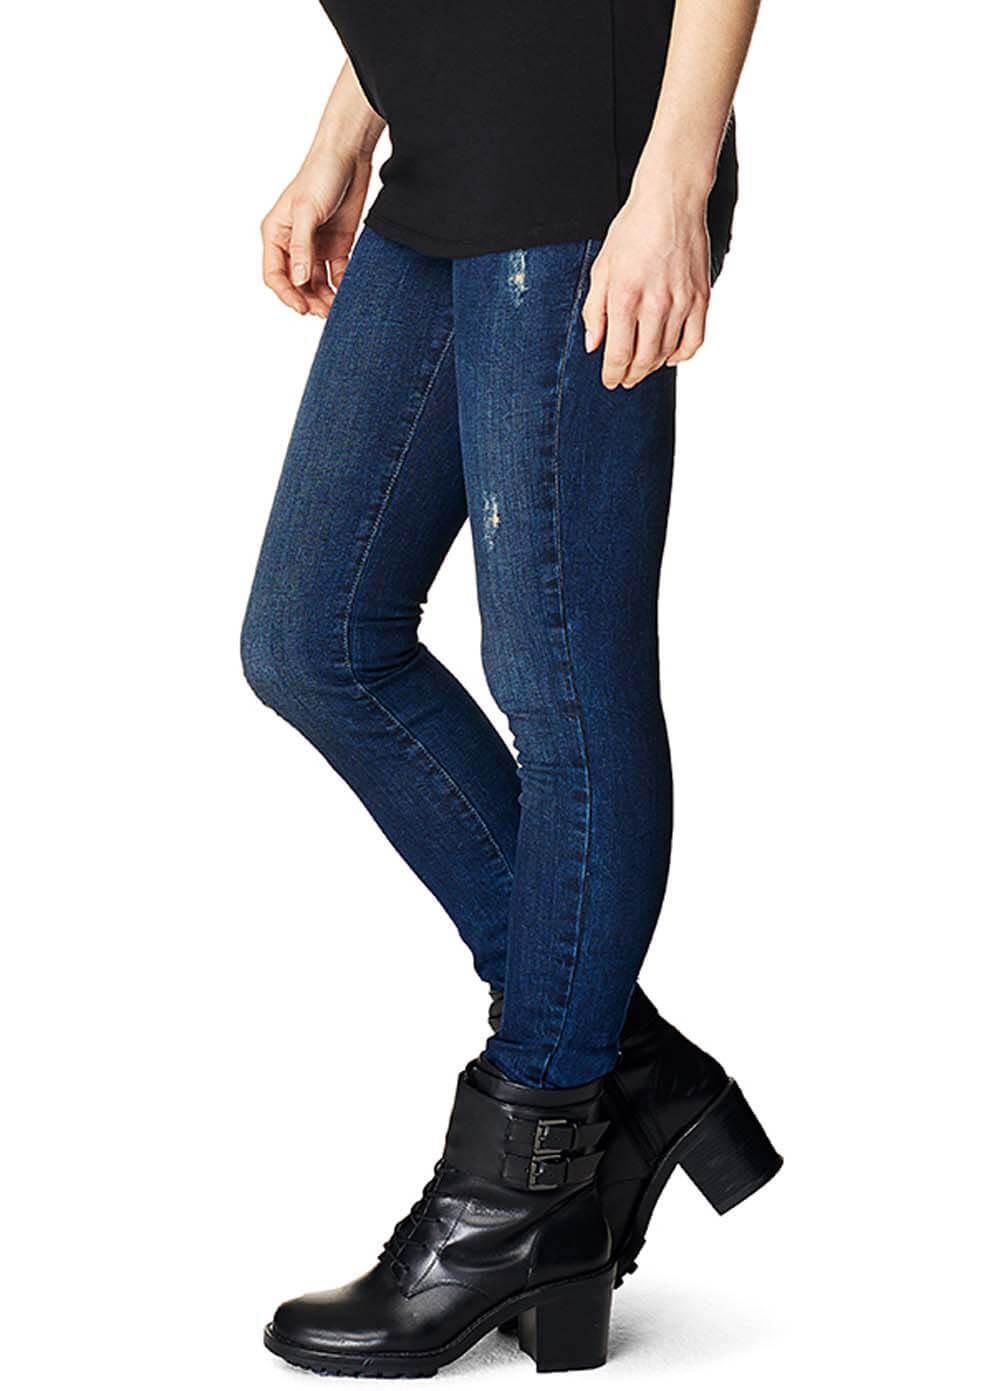 7eba42735dde5 Distressed Blue Skinny Maternity Jeans by Supermom